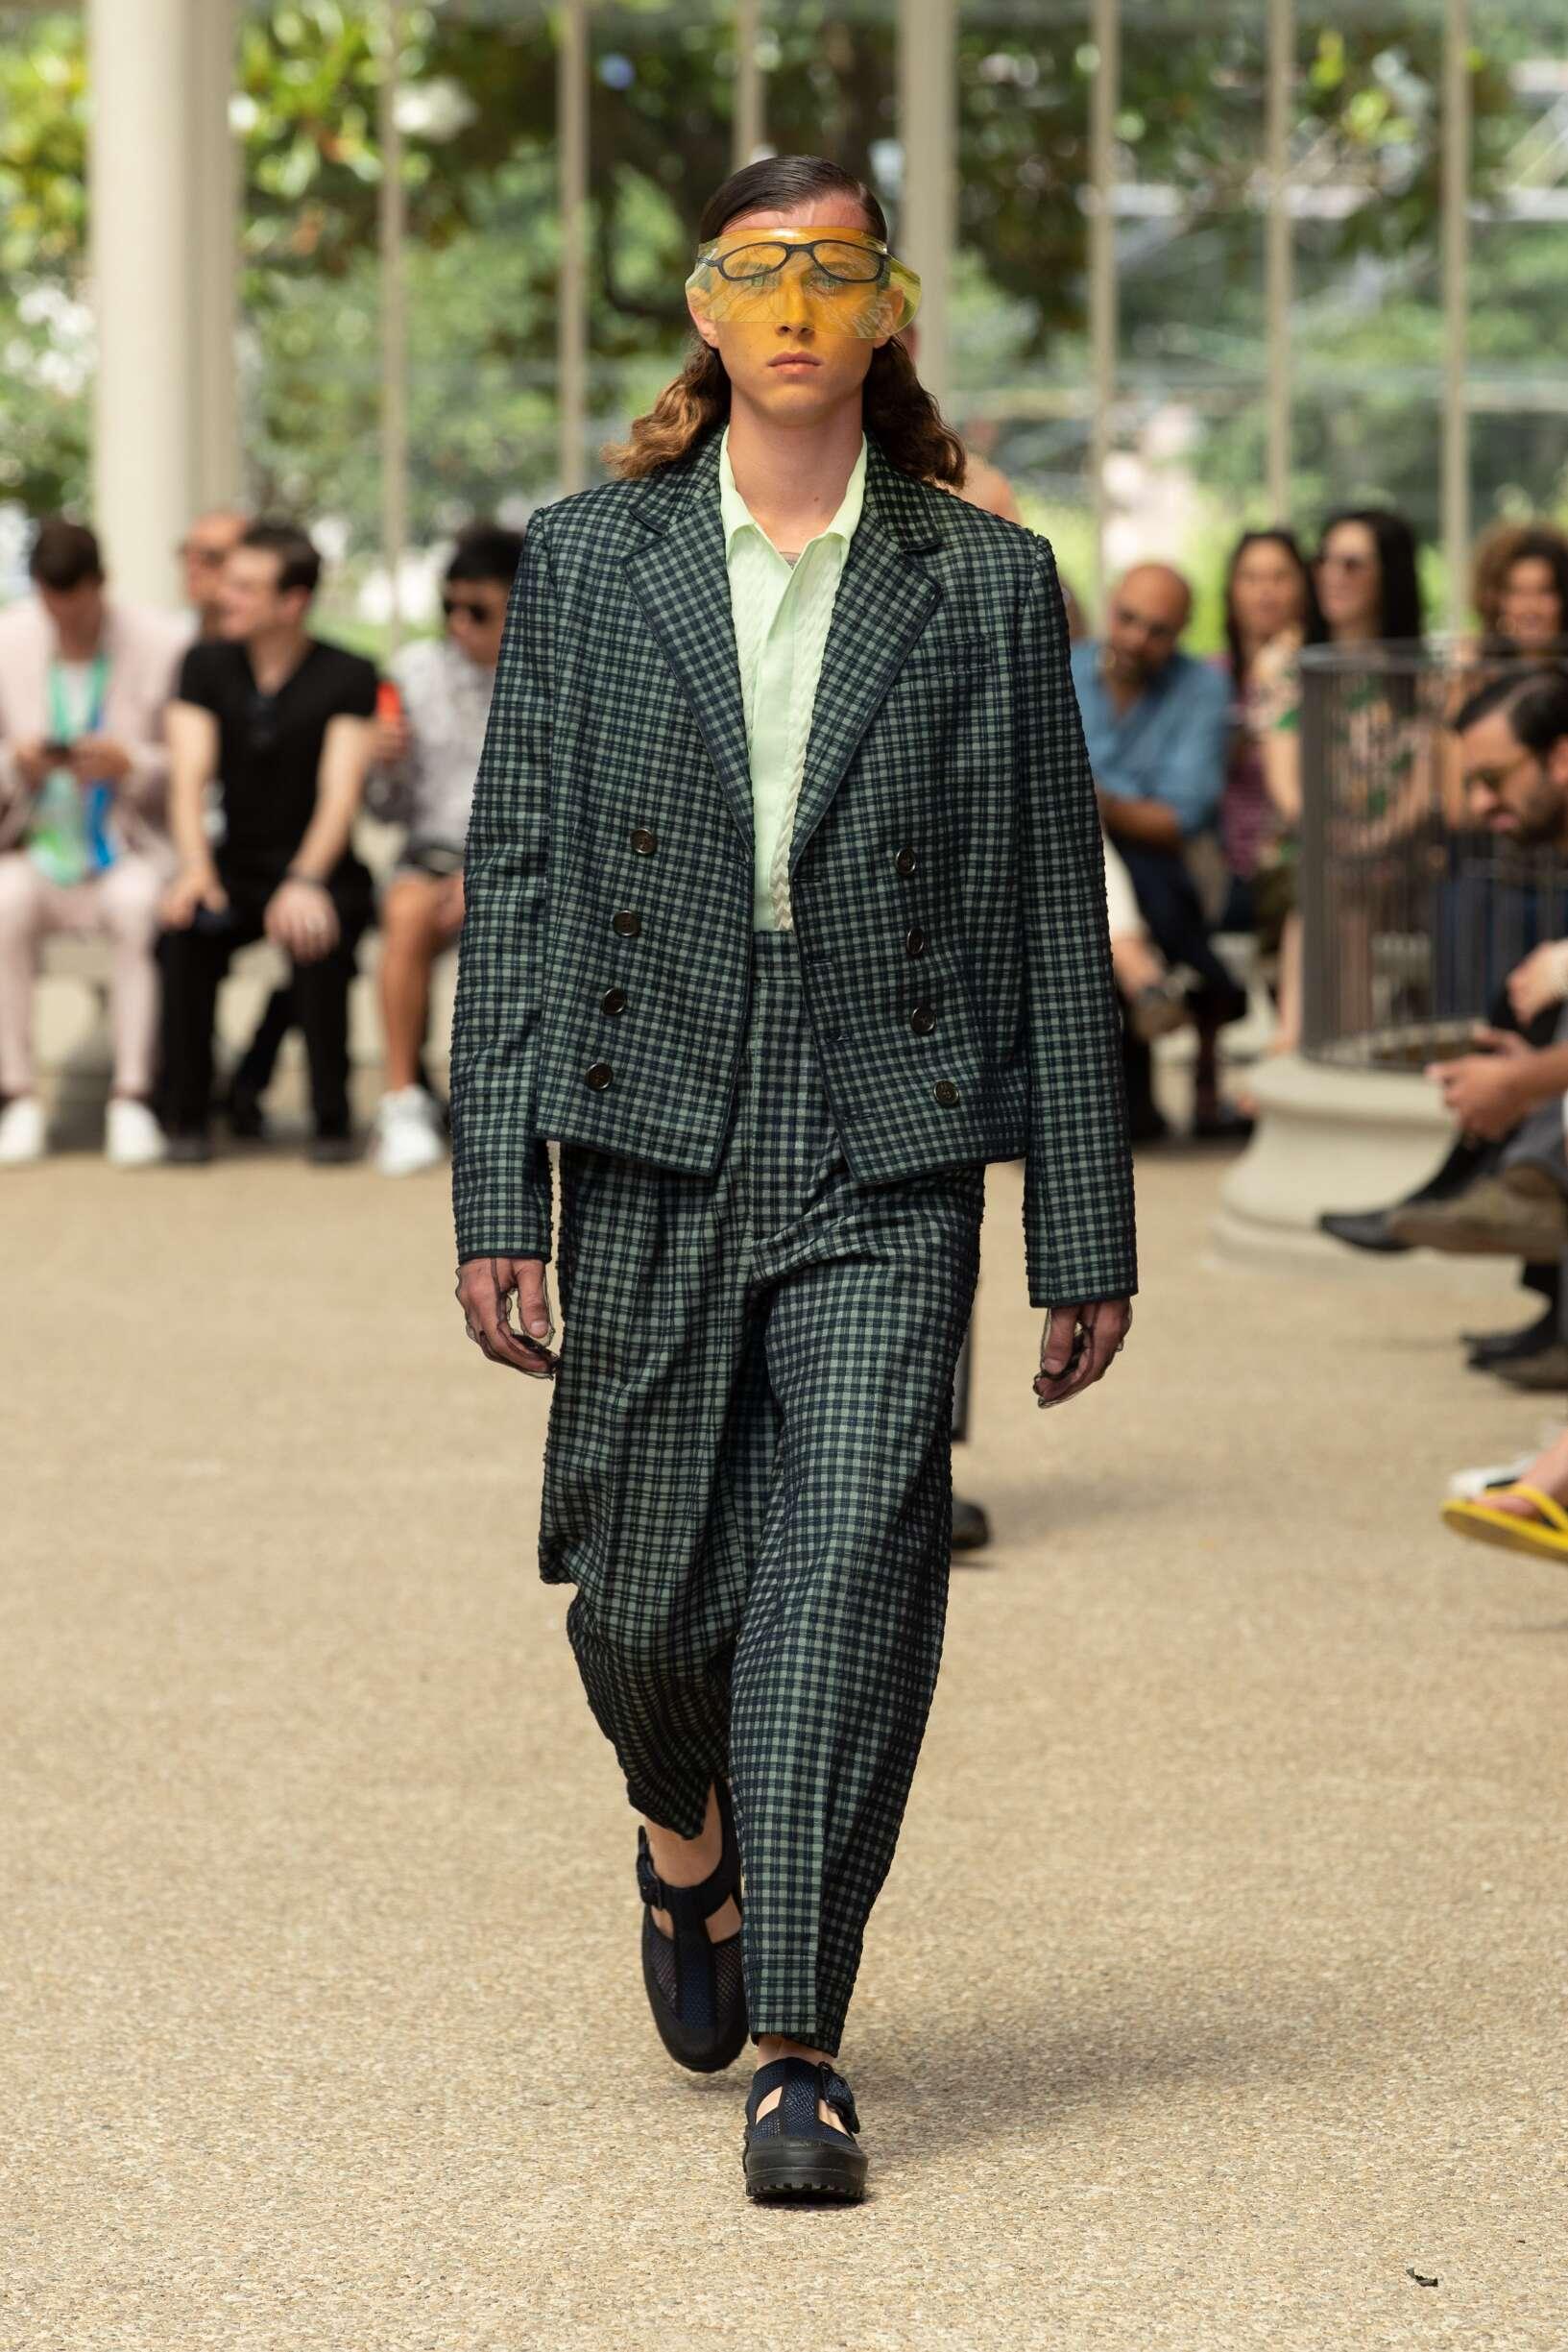 Fashion 2020 Catwalk Marco De vincenzo Summer Man Collection